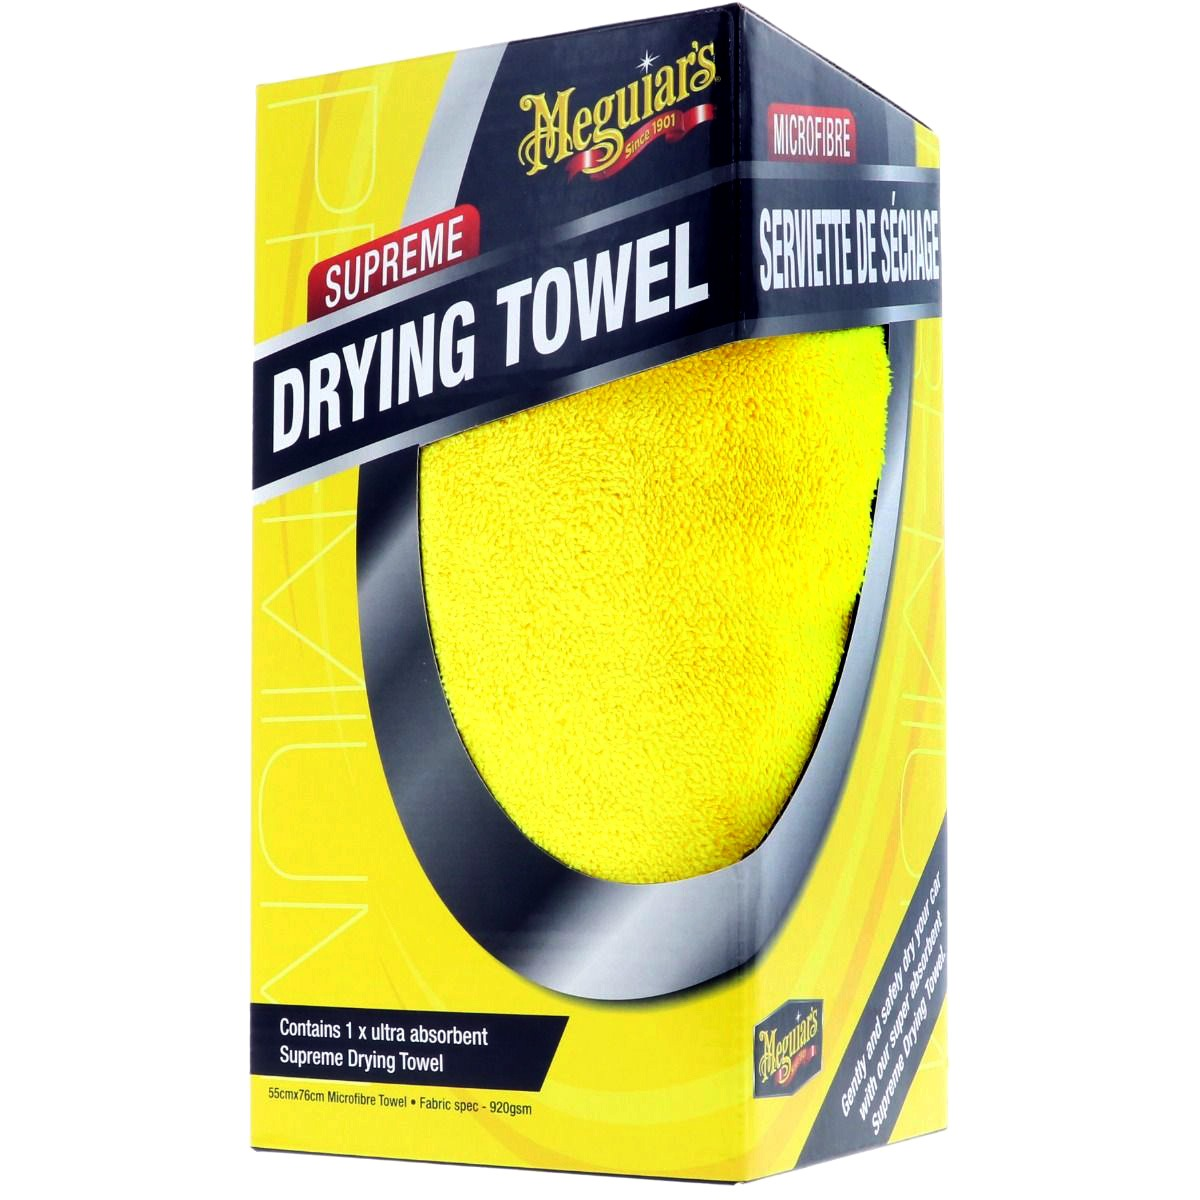 Meguiar's® Supreme Draying Towel